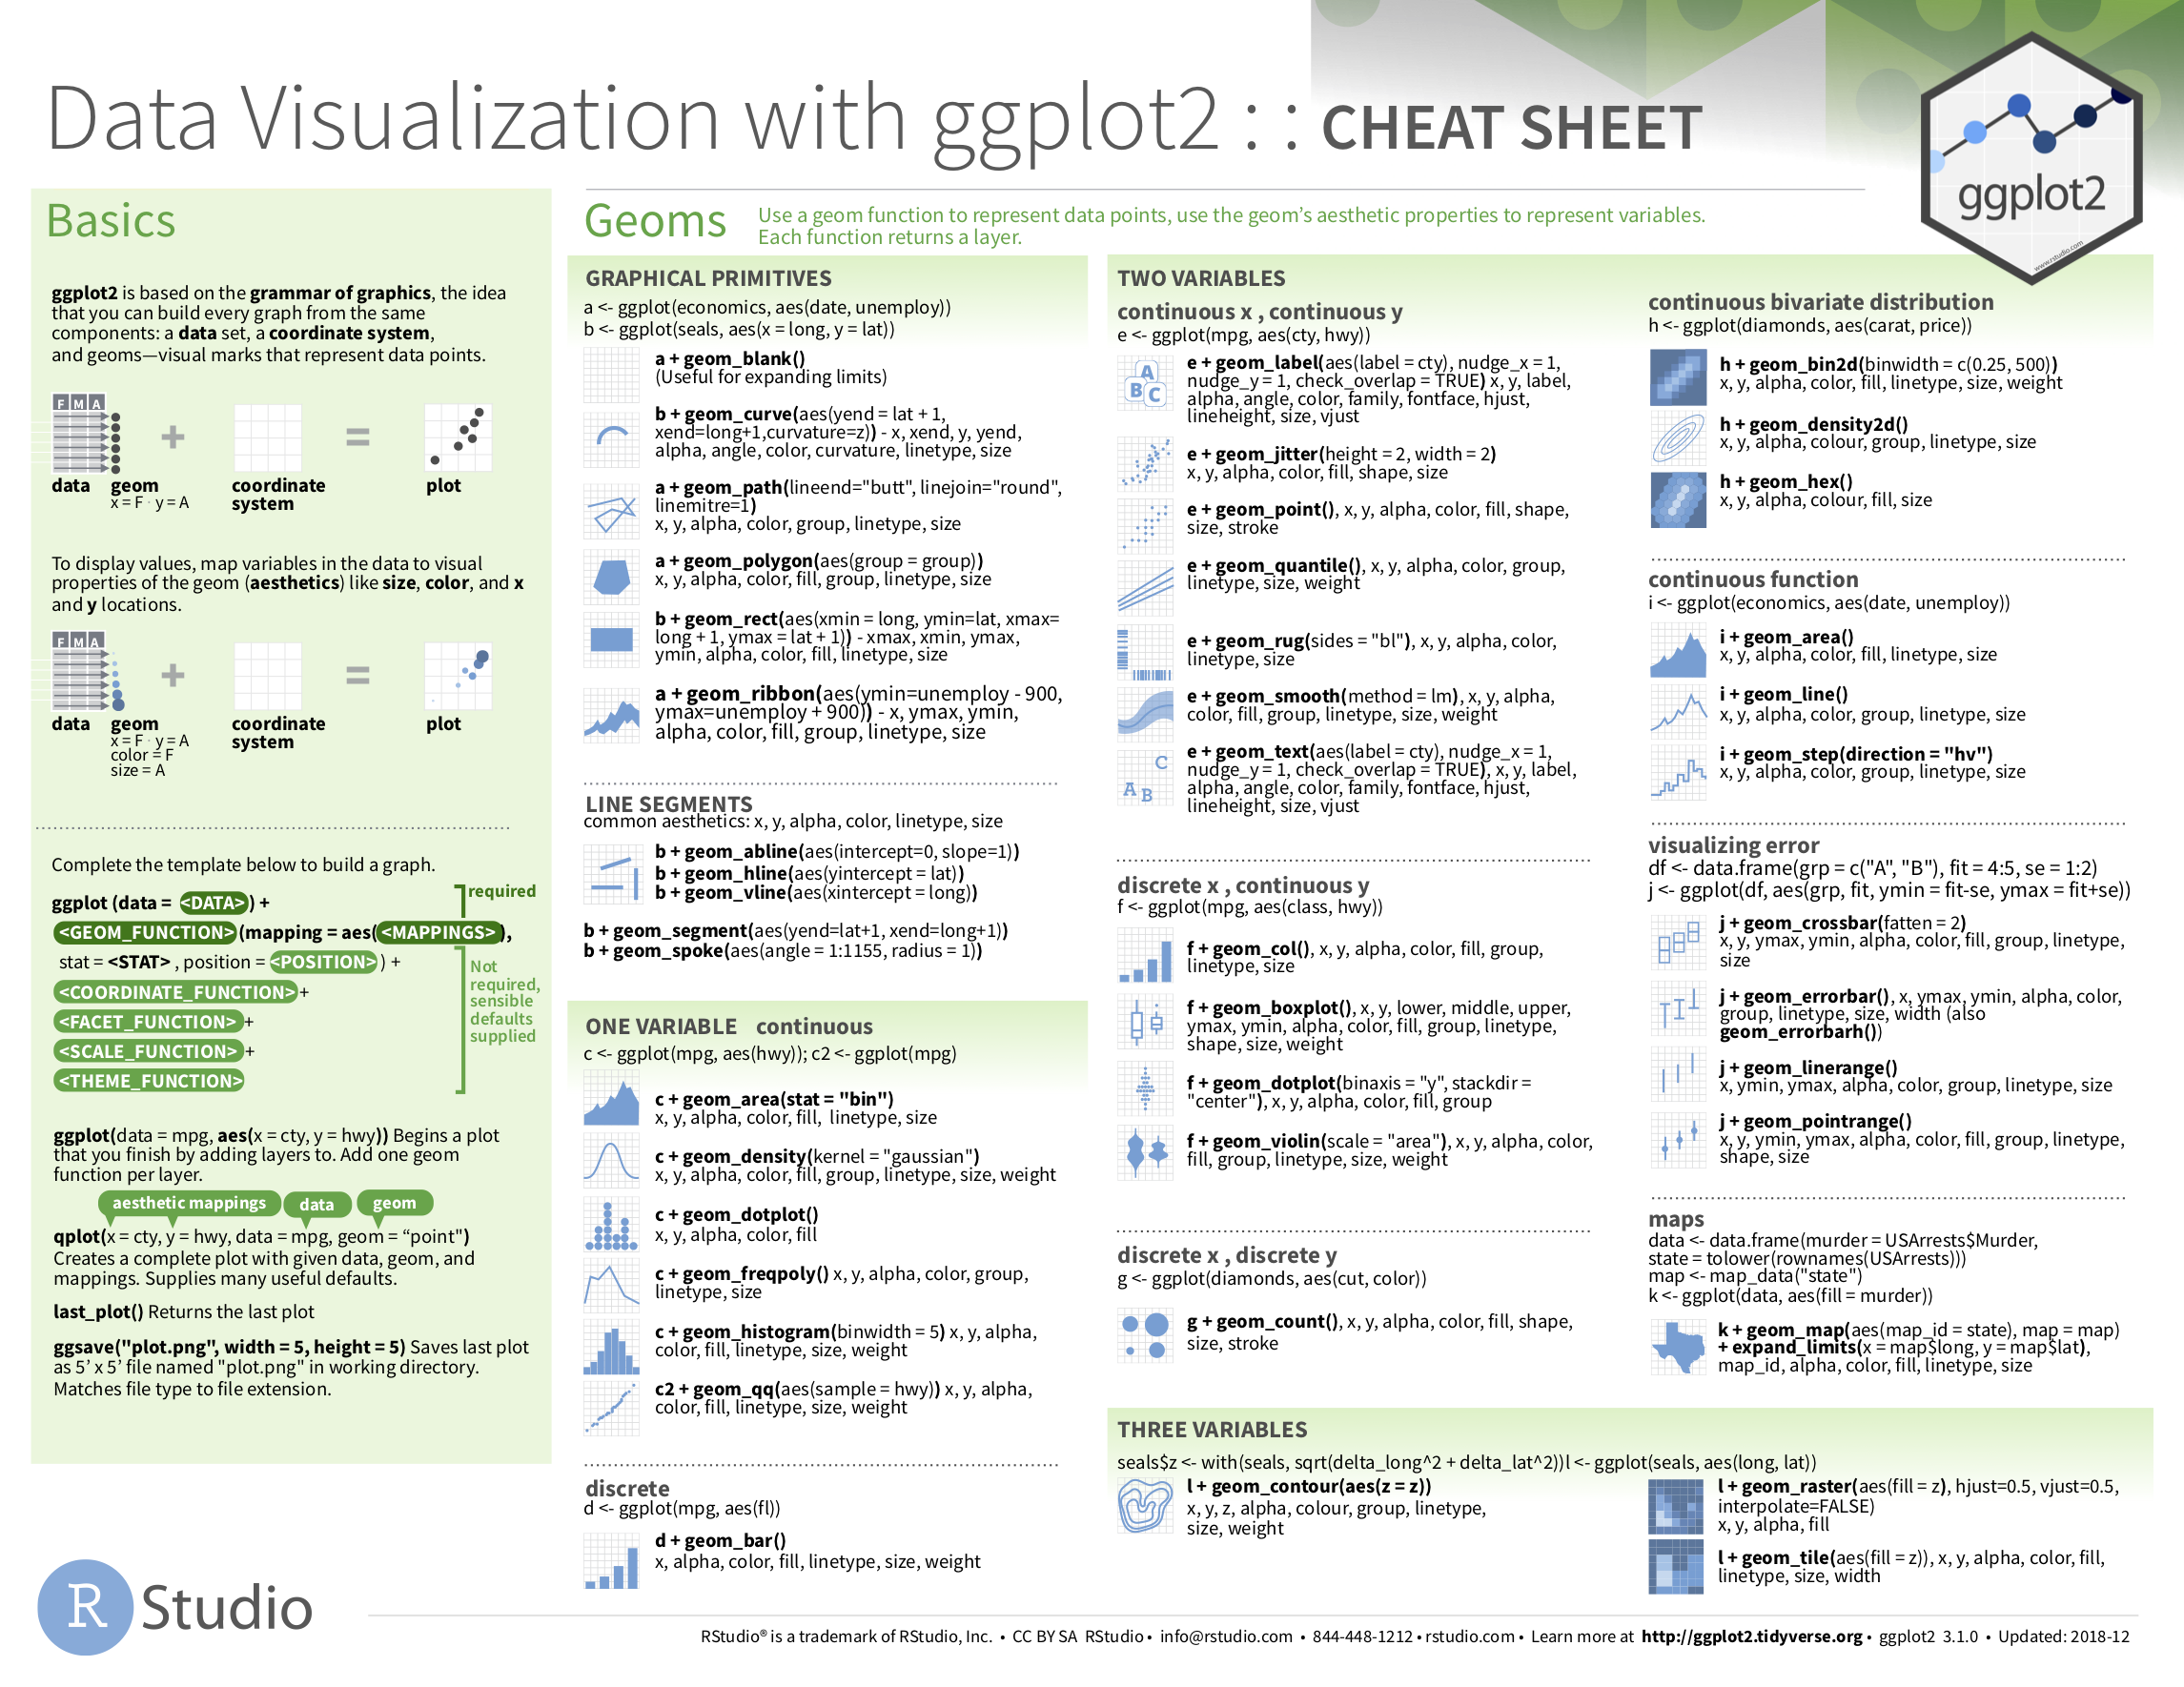 Data Visualization with ggplot2 cheatsheet.